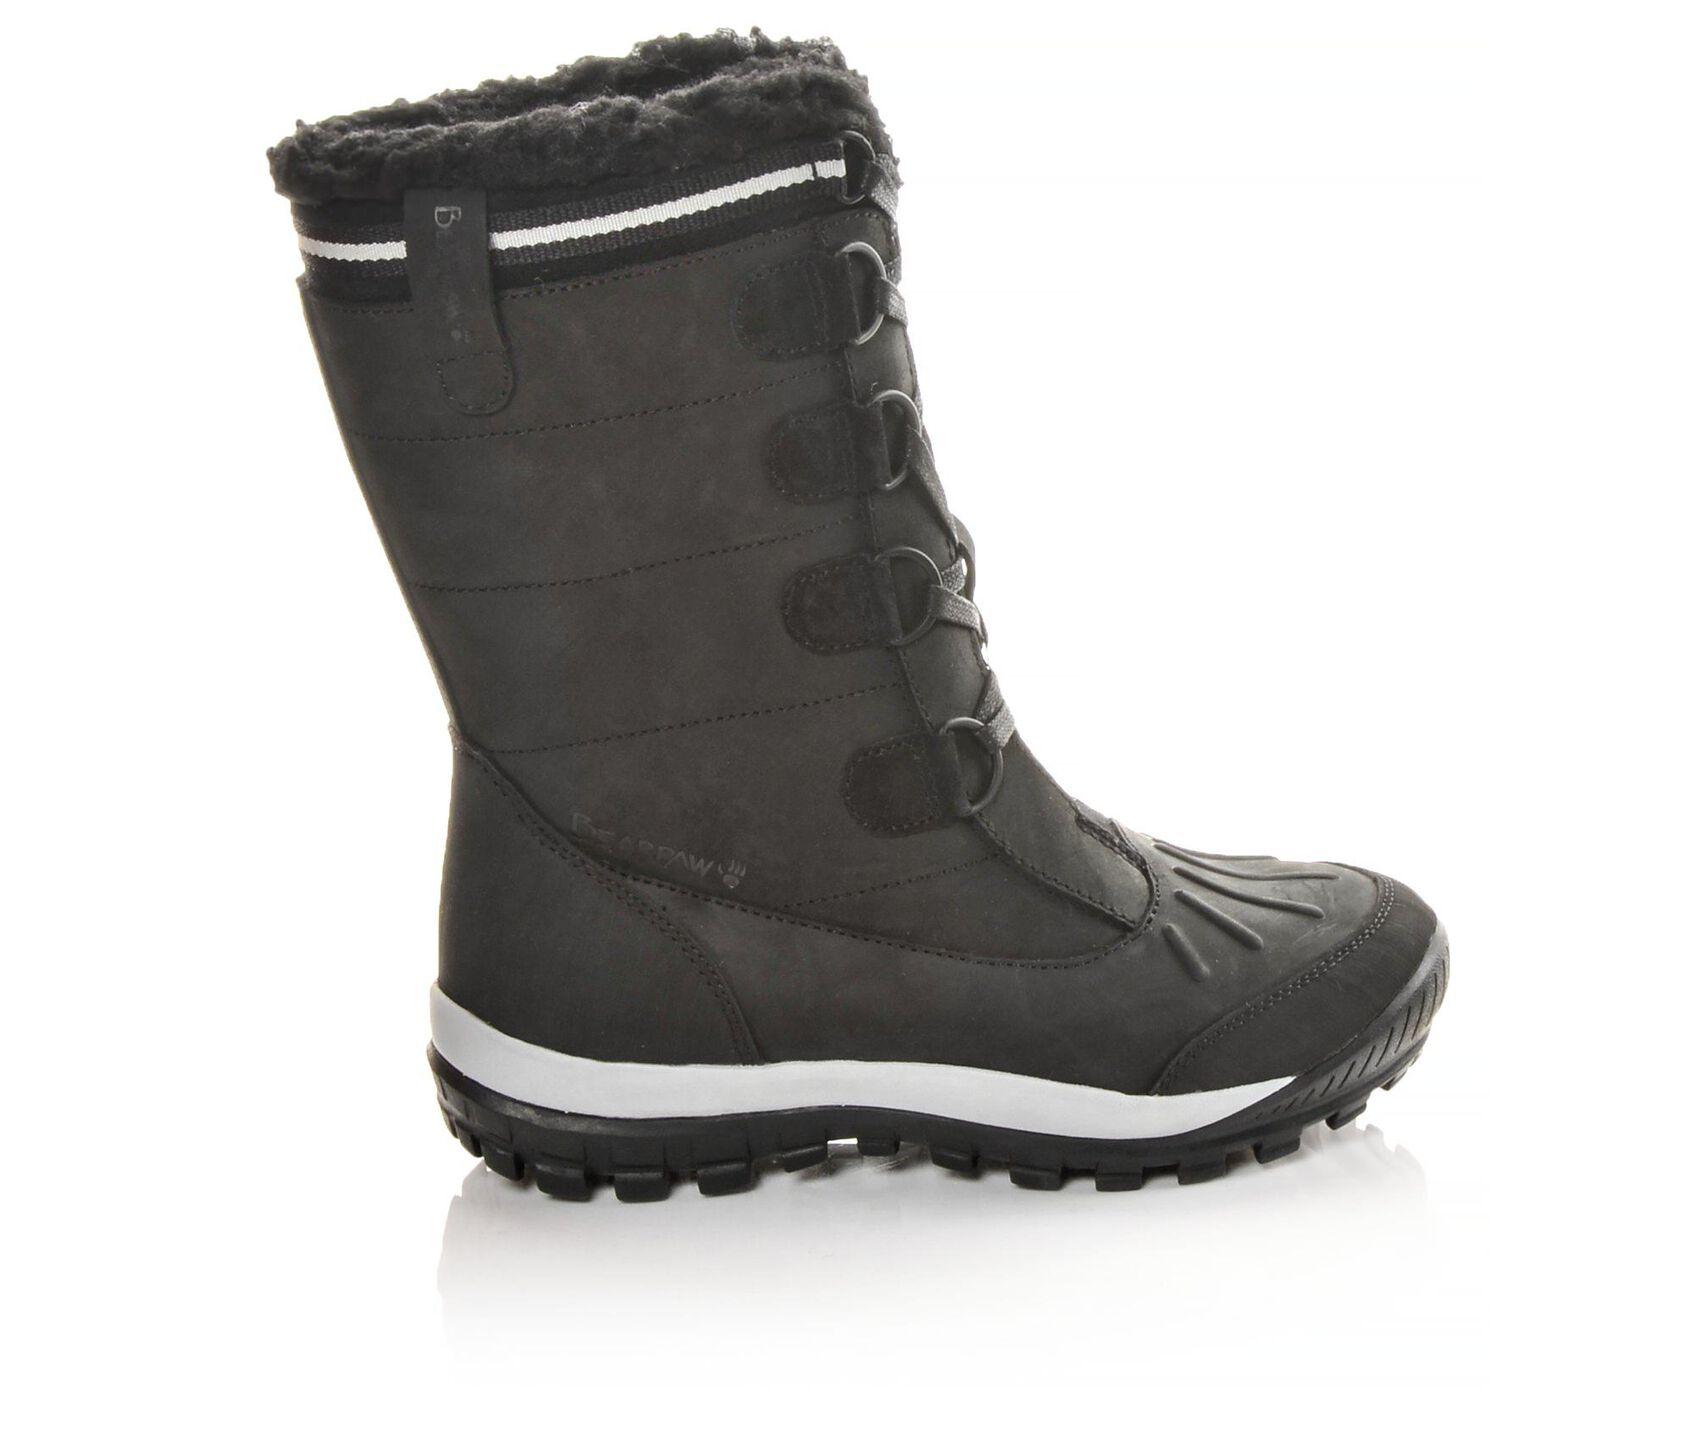 f6c4df21a18 Women's Bearpaw Desdemona Boots